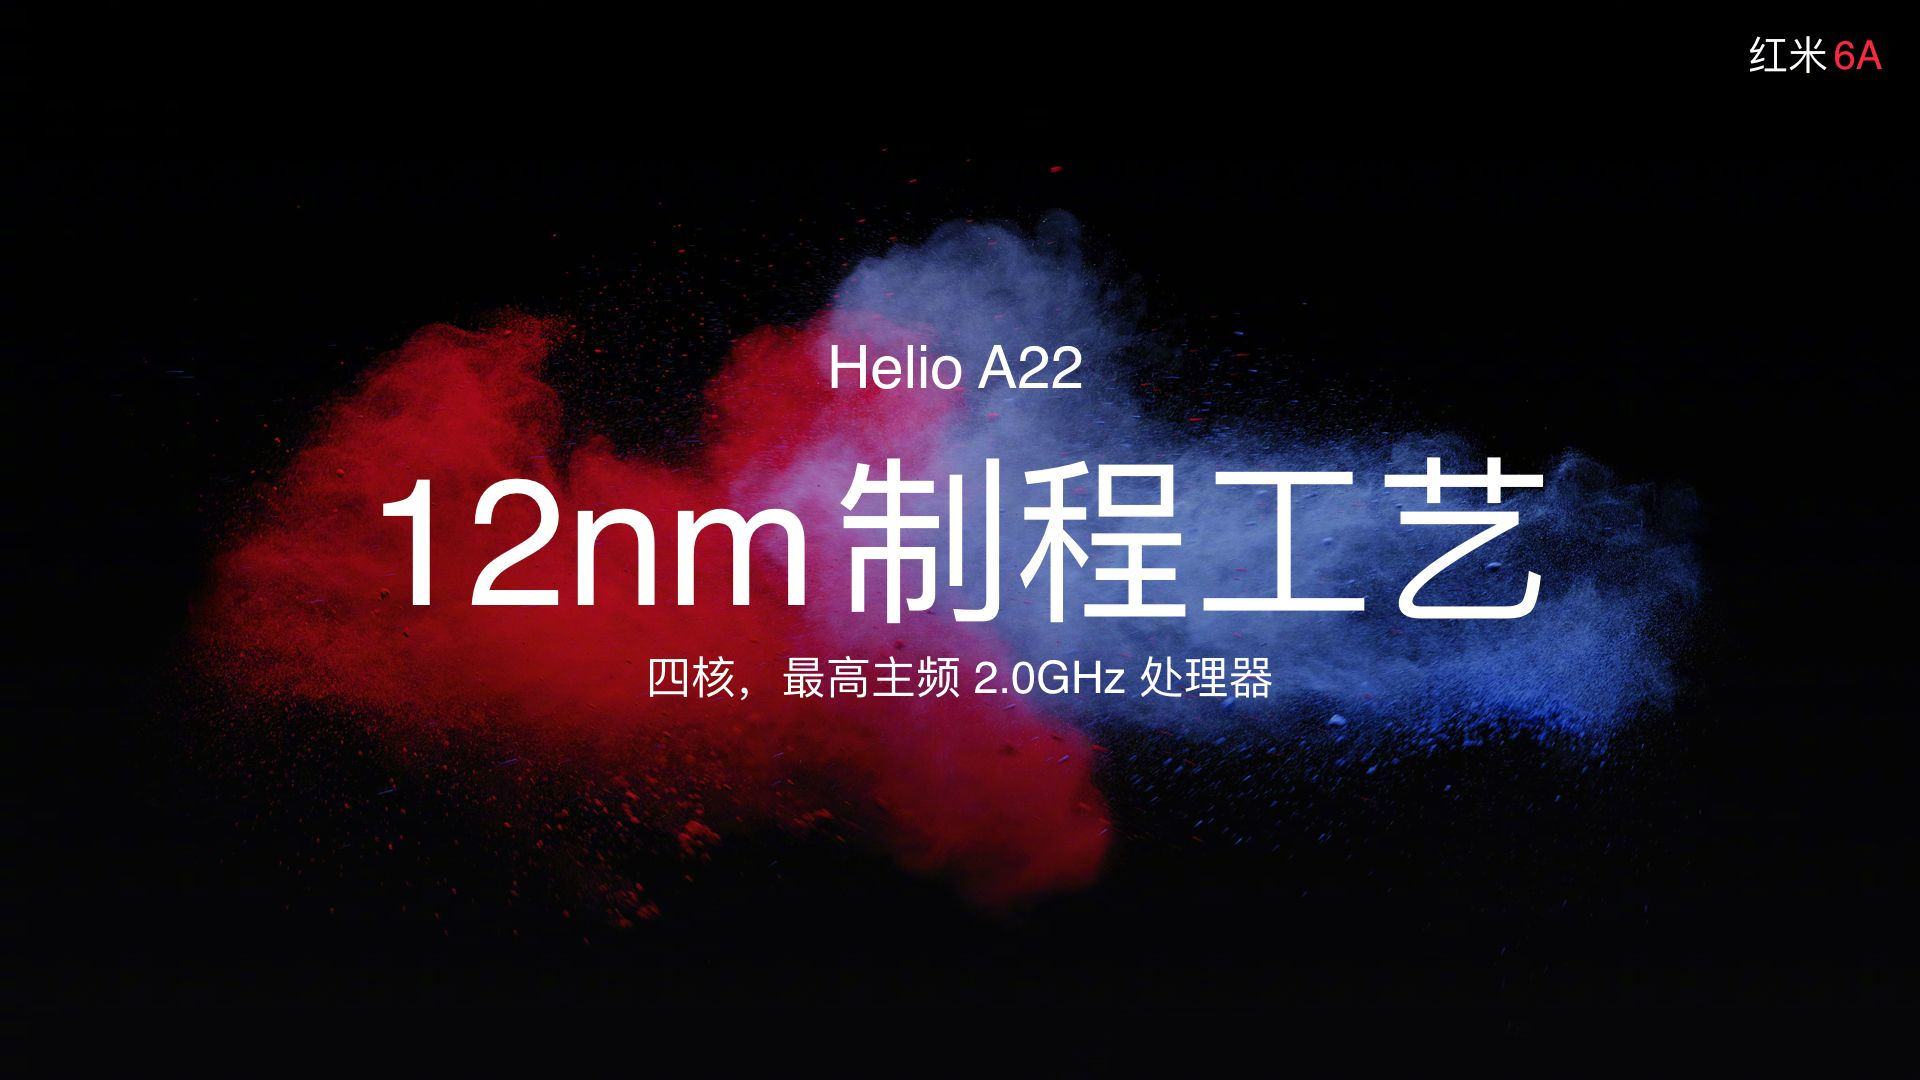 MediaTek Helio A22を発表。2.0GHzのA53x4のミドルレンジ向けプロセッサー